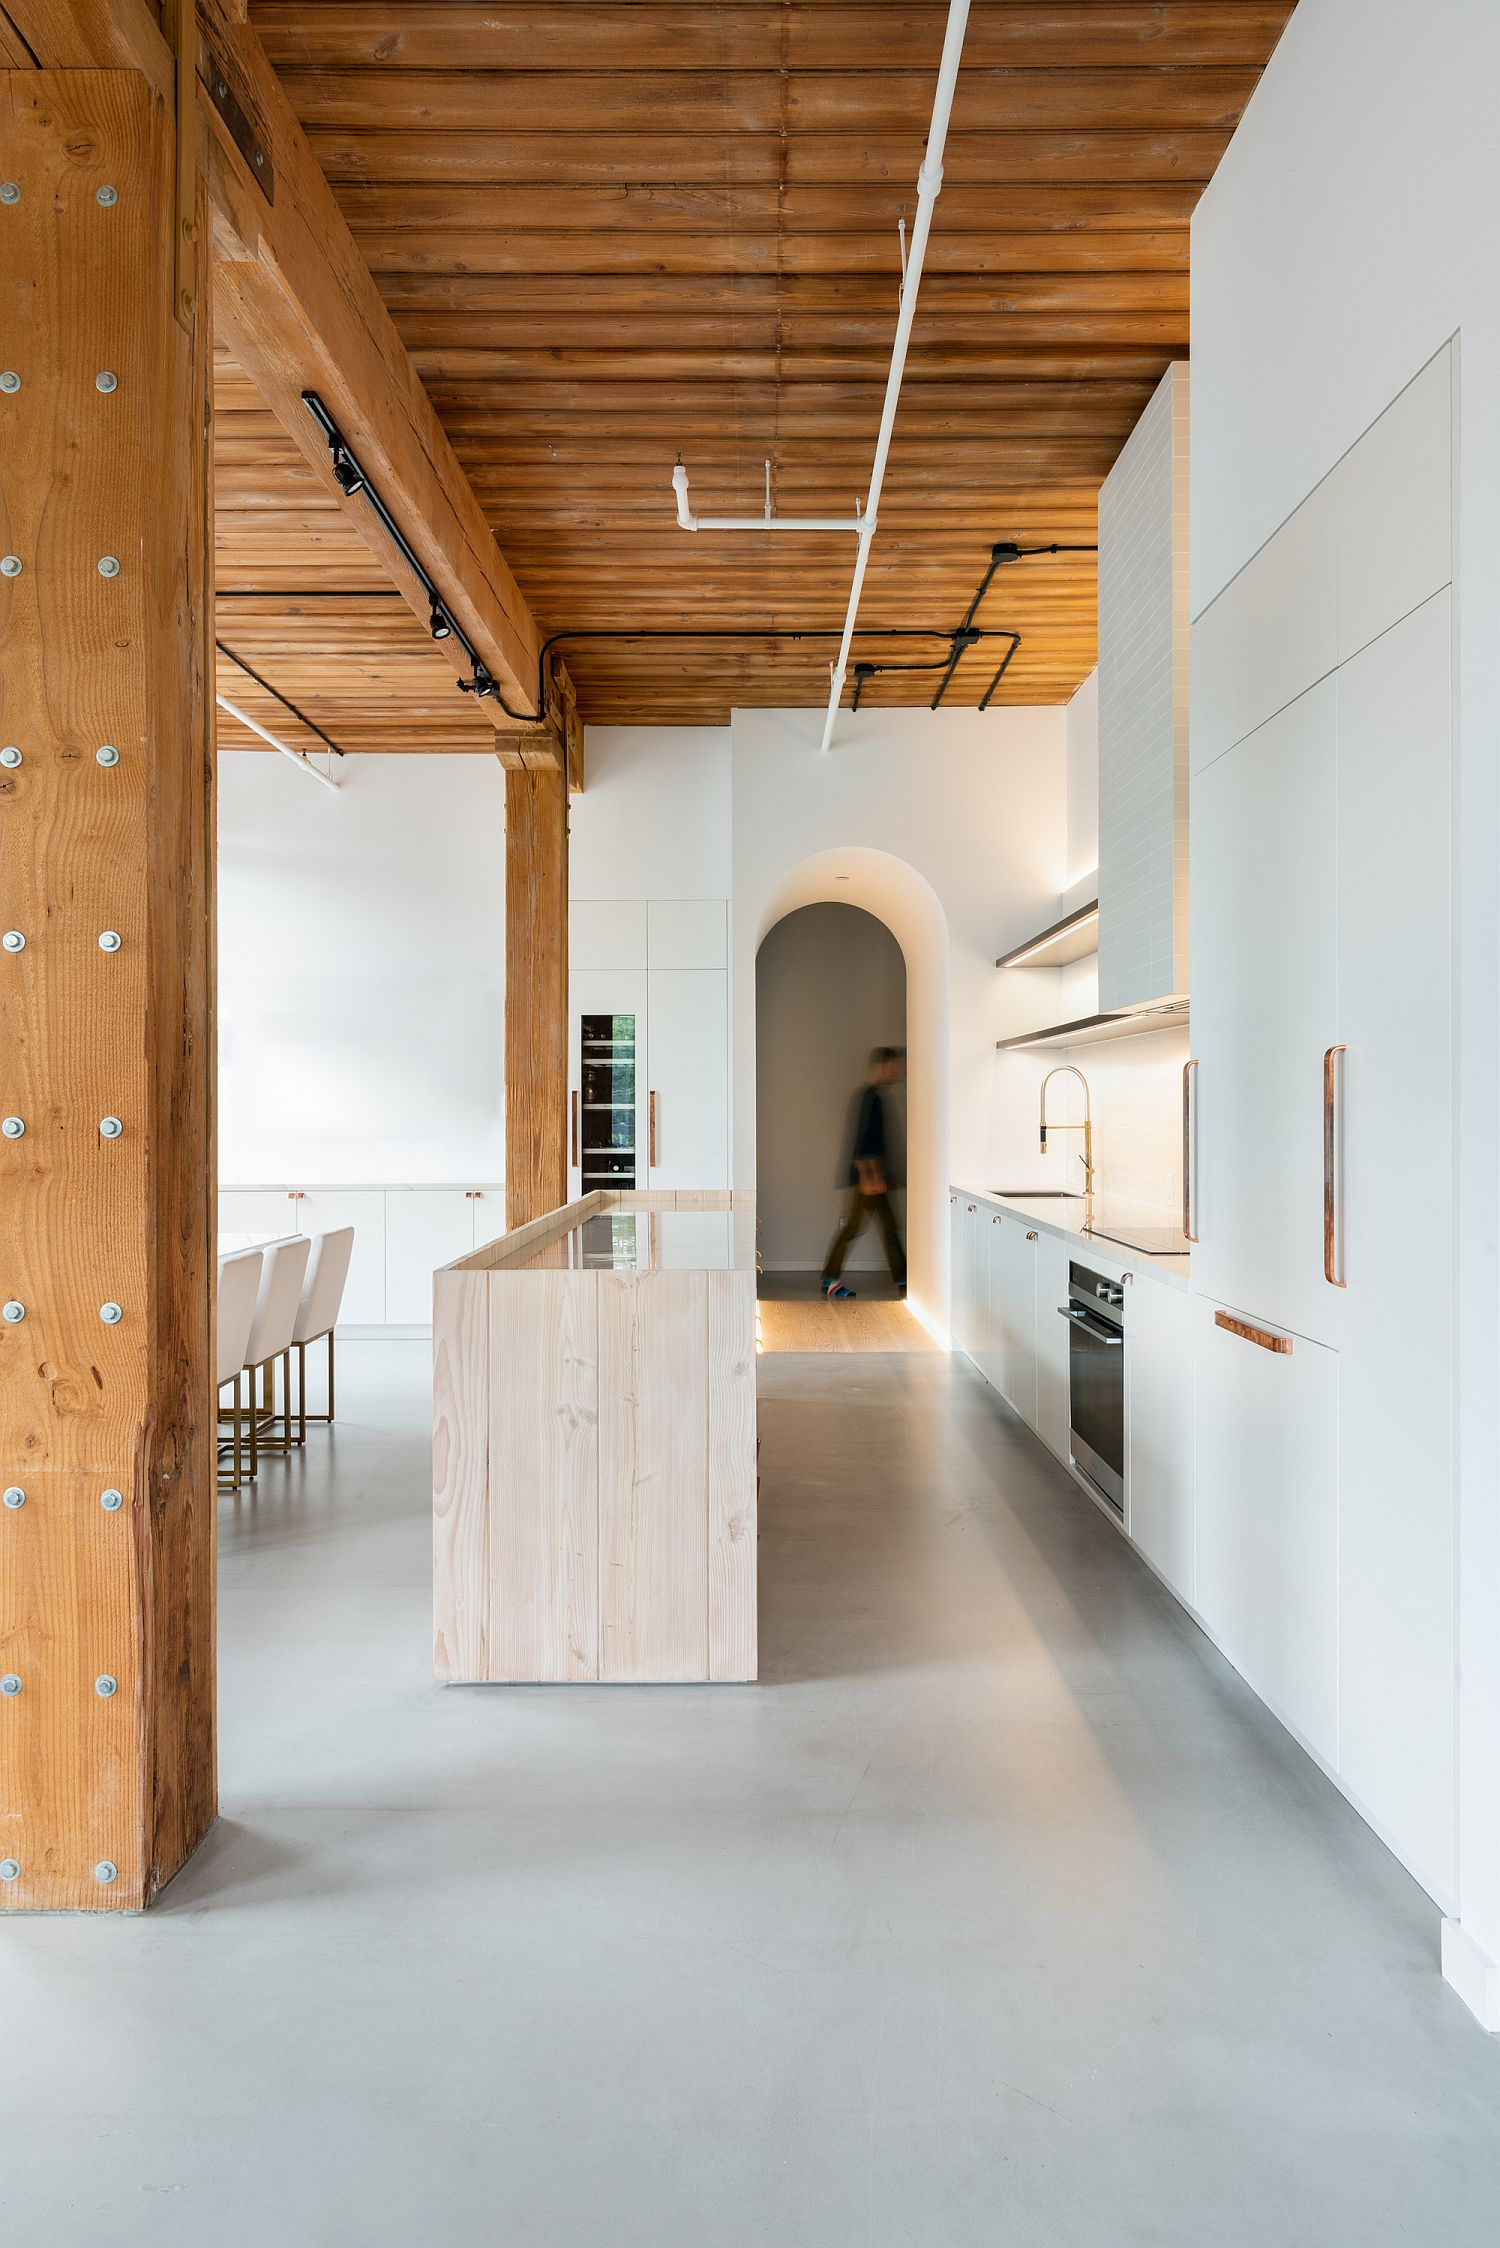 Douglas Fir and Cozy Lighting Shape Sensationally Refined Downtown Loft in Toronto